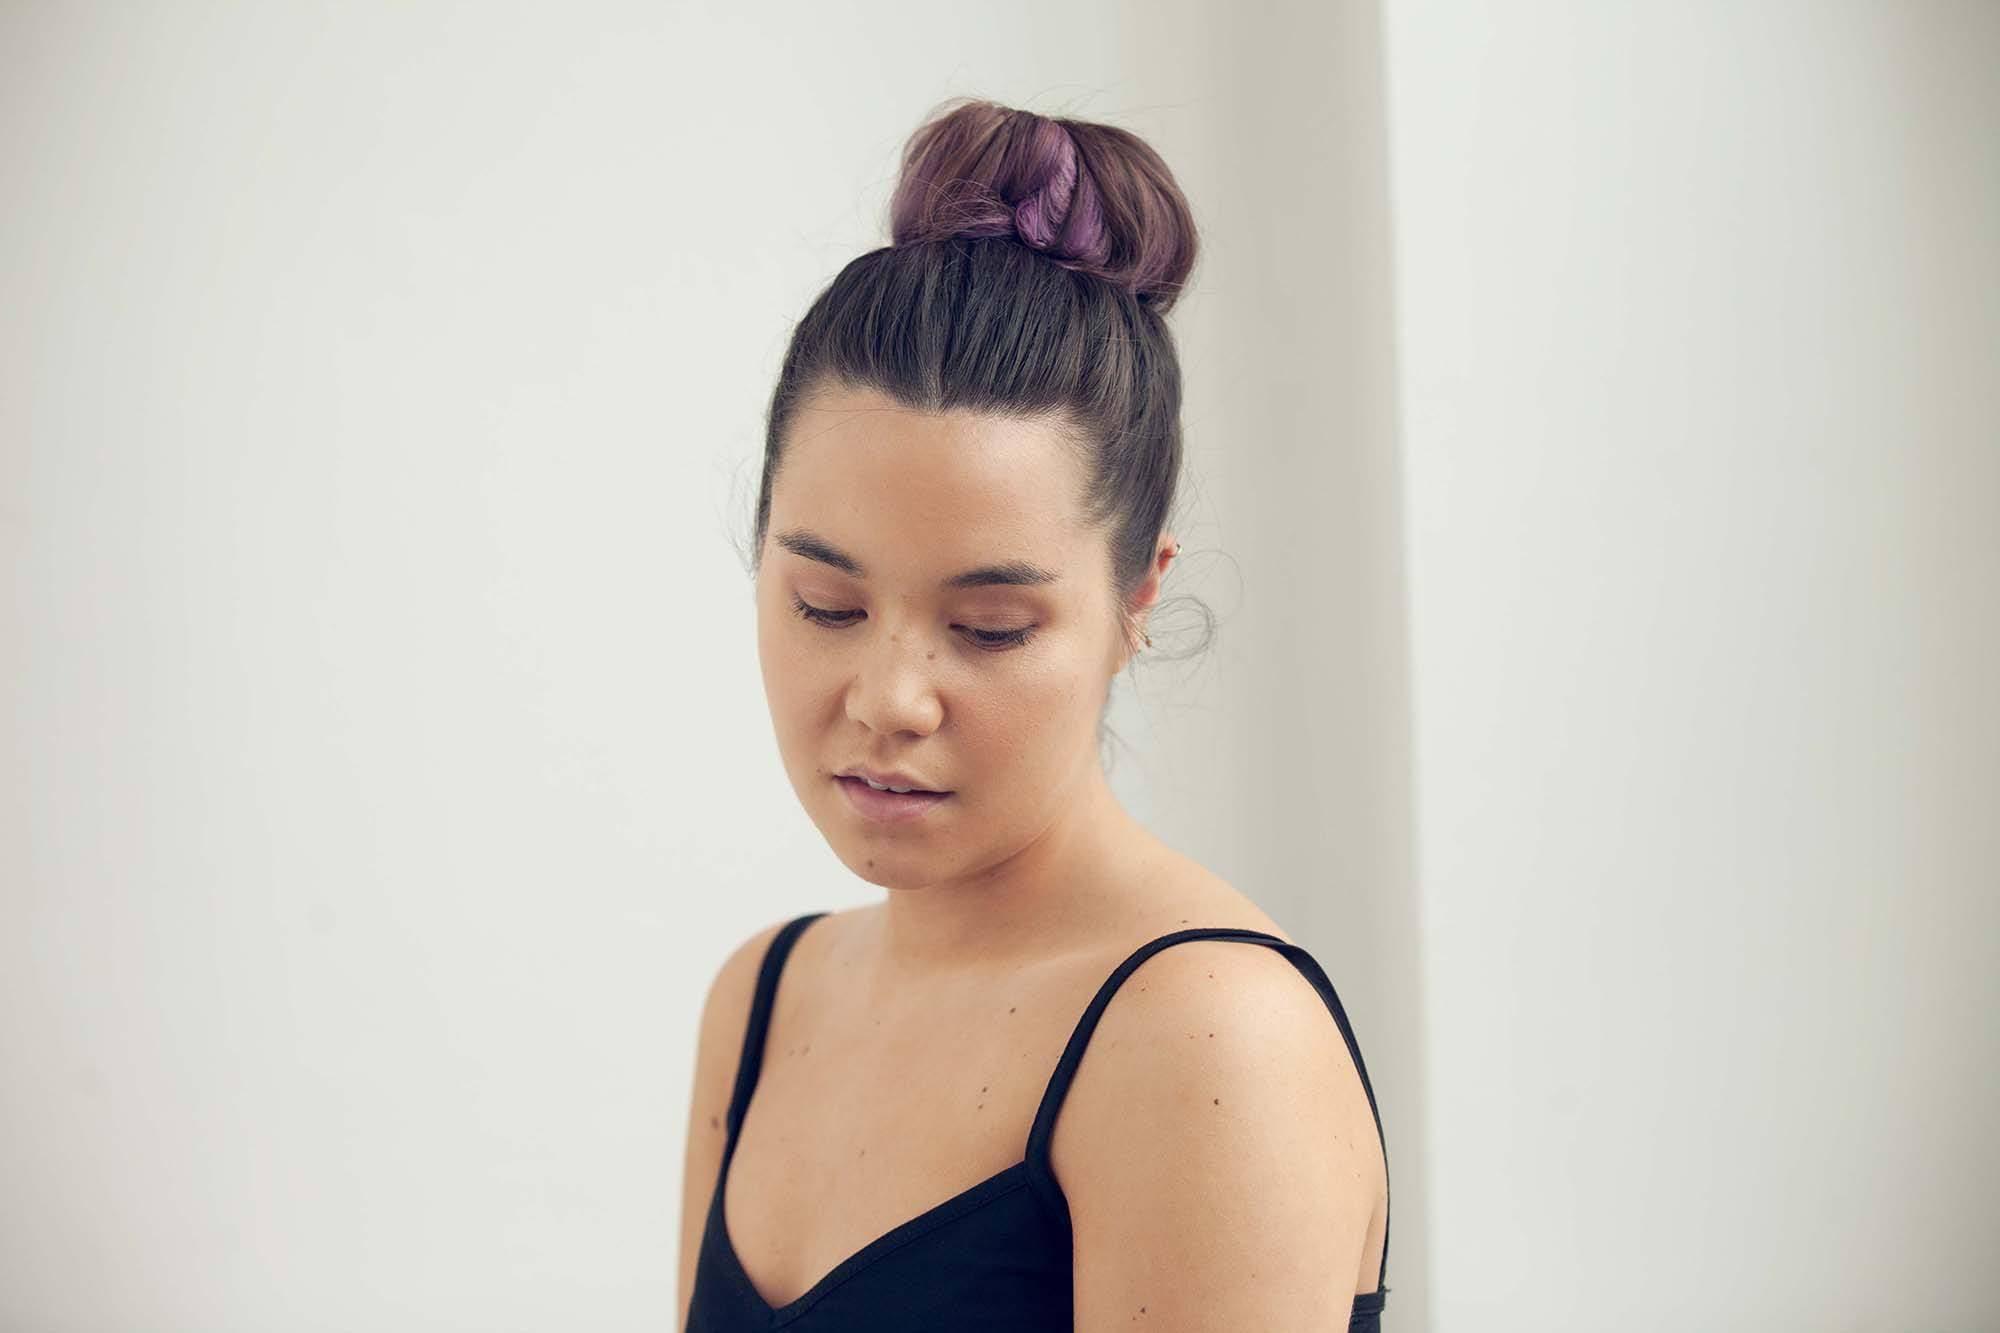 easy bun hairstyles: woman with brown hair styled in a high hair donut bun hairstyle